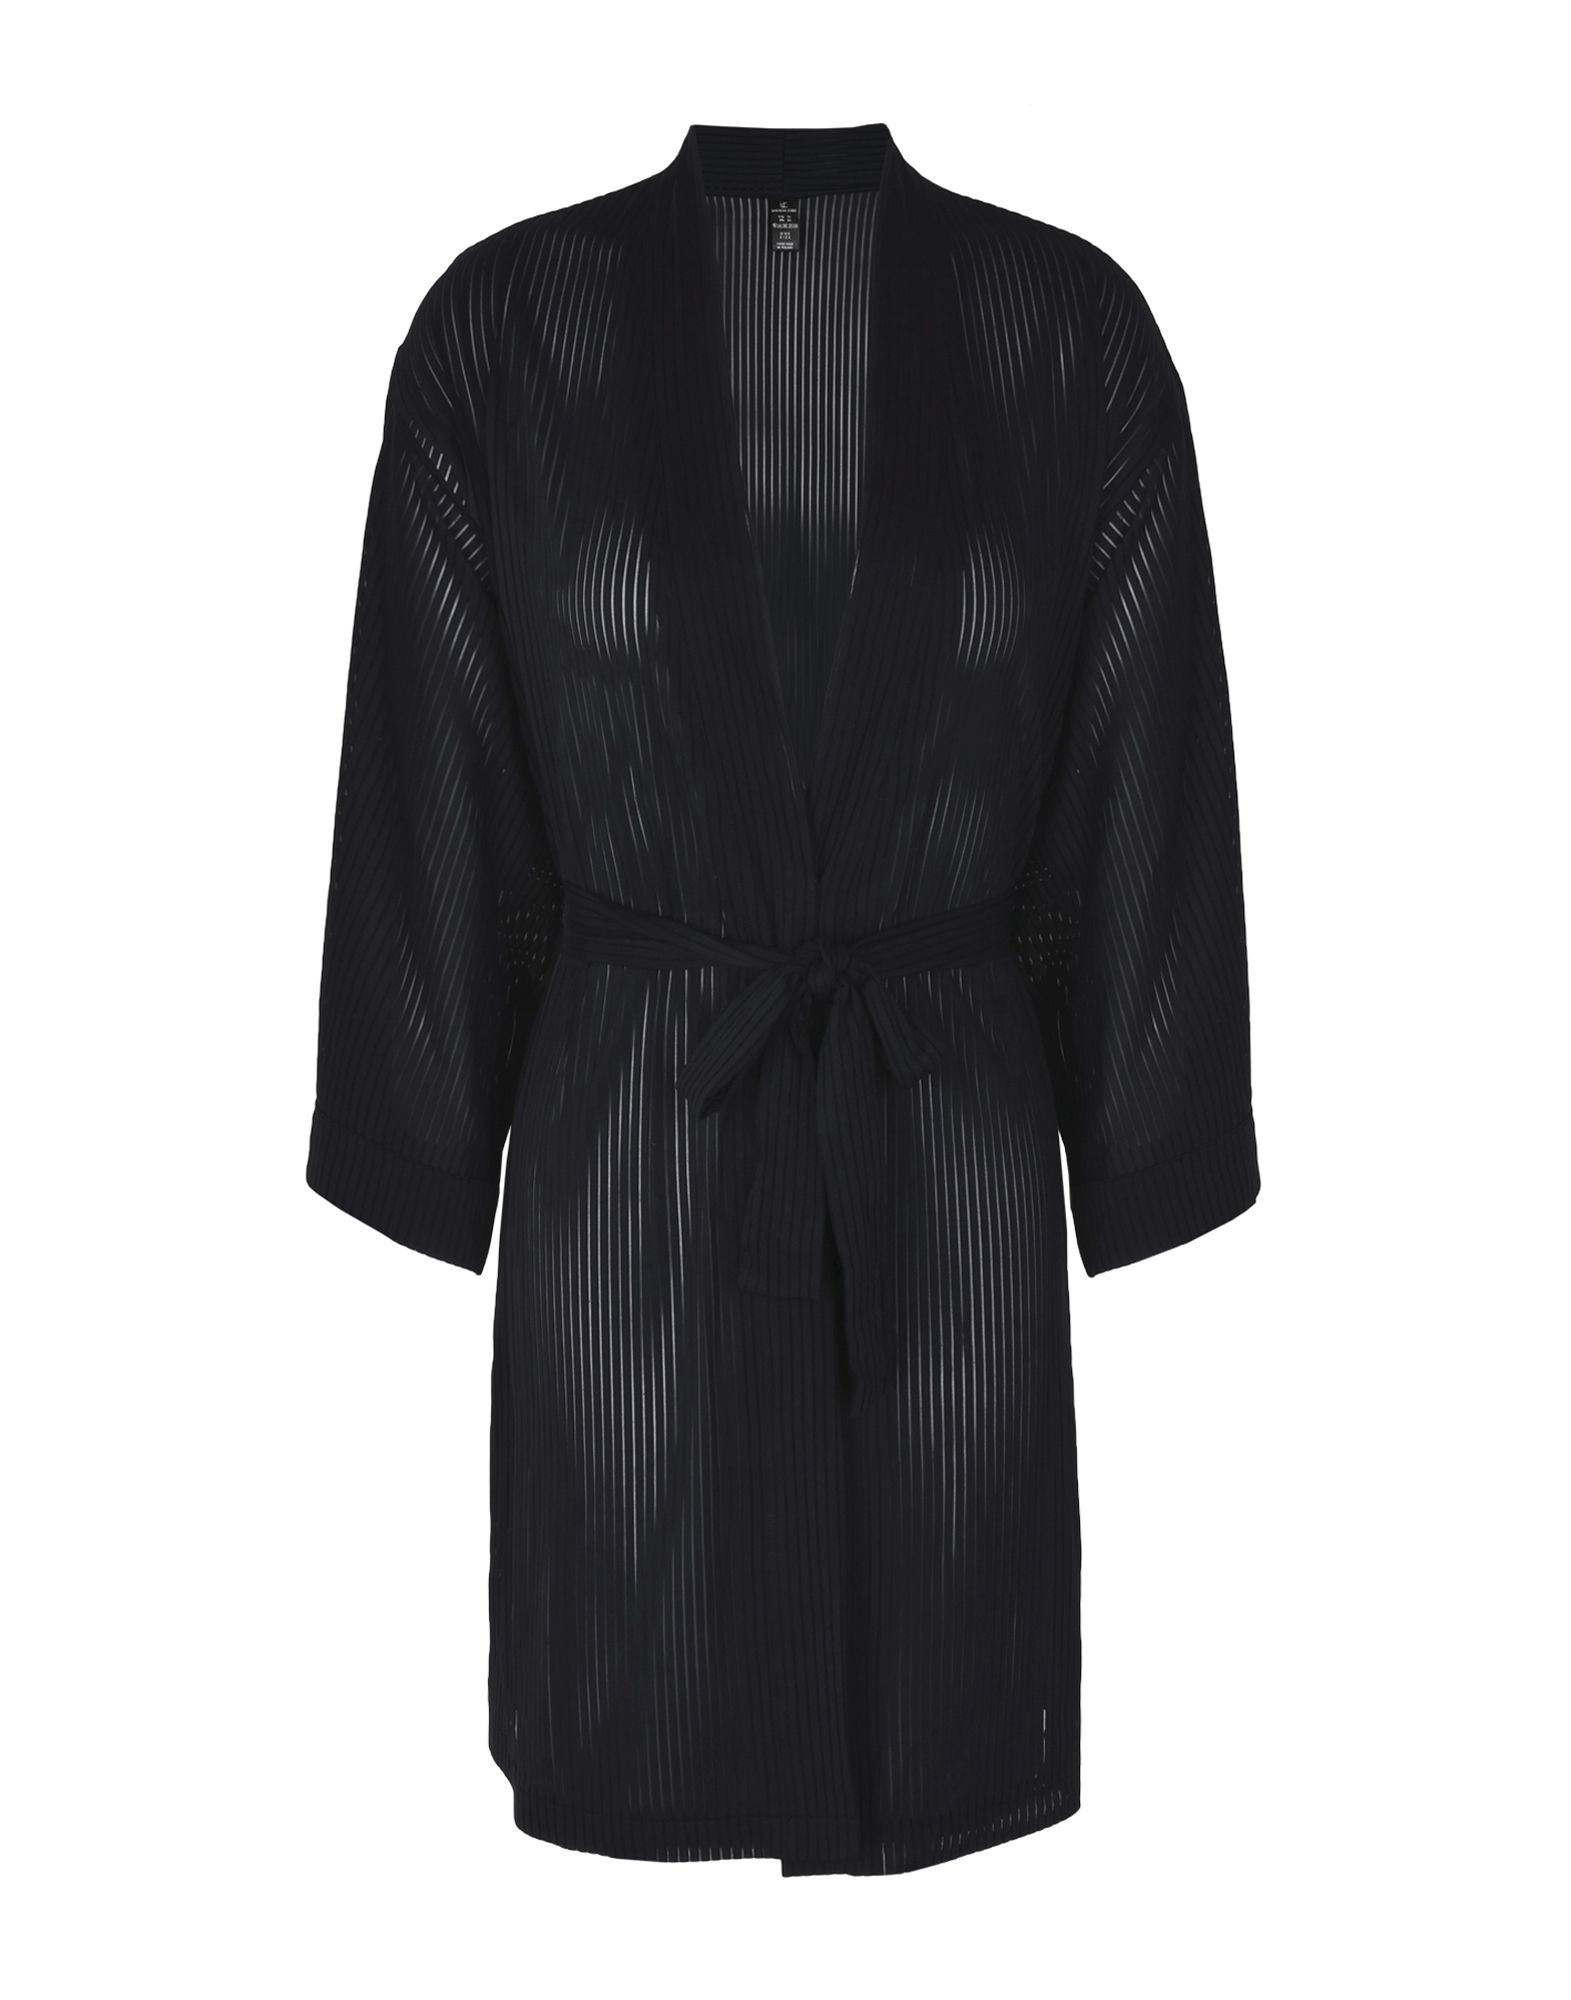 Vestaglia Undress Code Donna - Acquista online su JLGnBNW